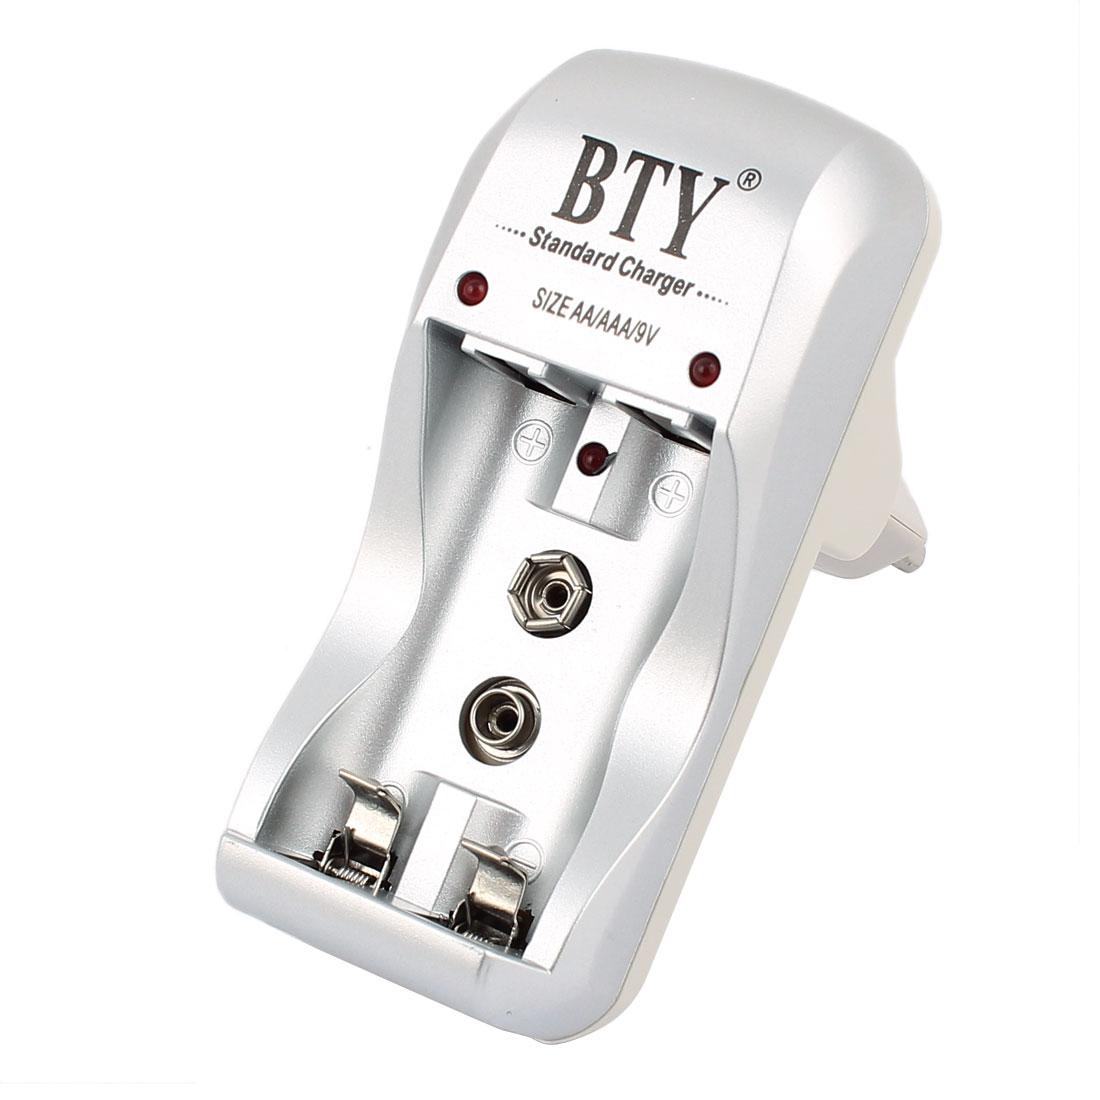 AC 100-240V EU Plug 1.2Vx2 A/AAA/9V/Ni-MH/Ni-Cd Rechargeable Battery Charger